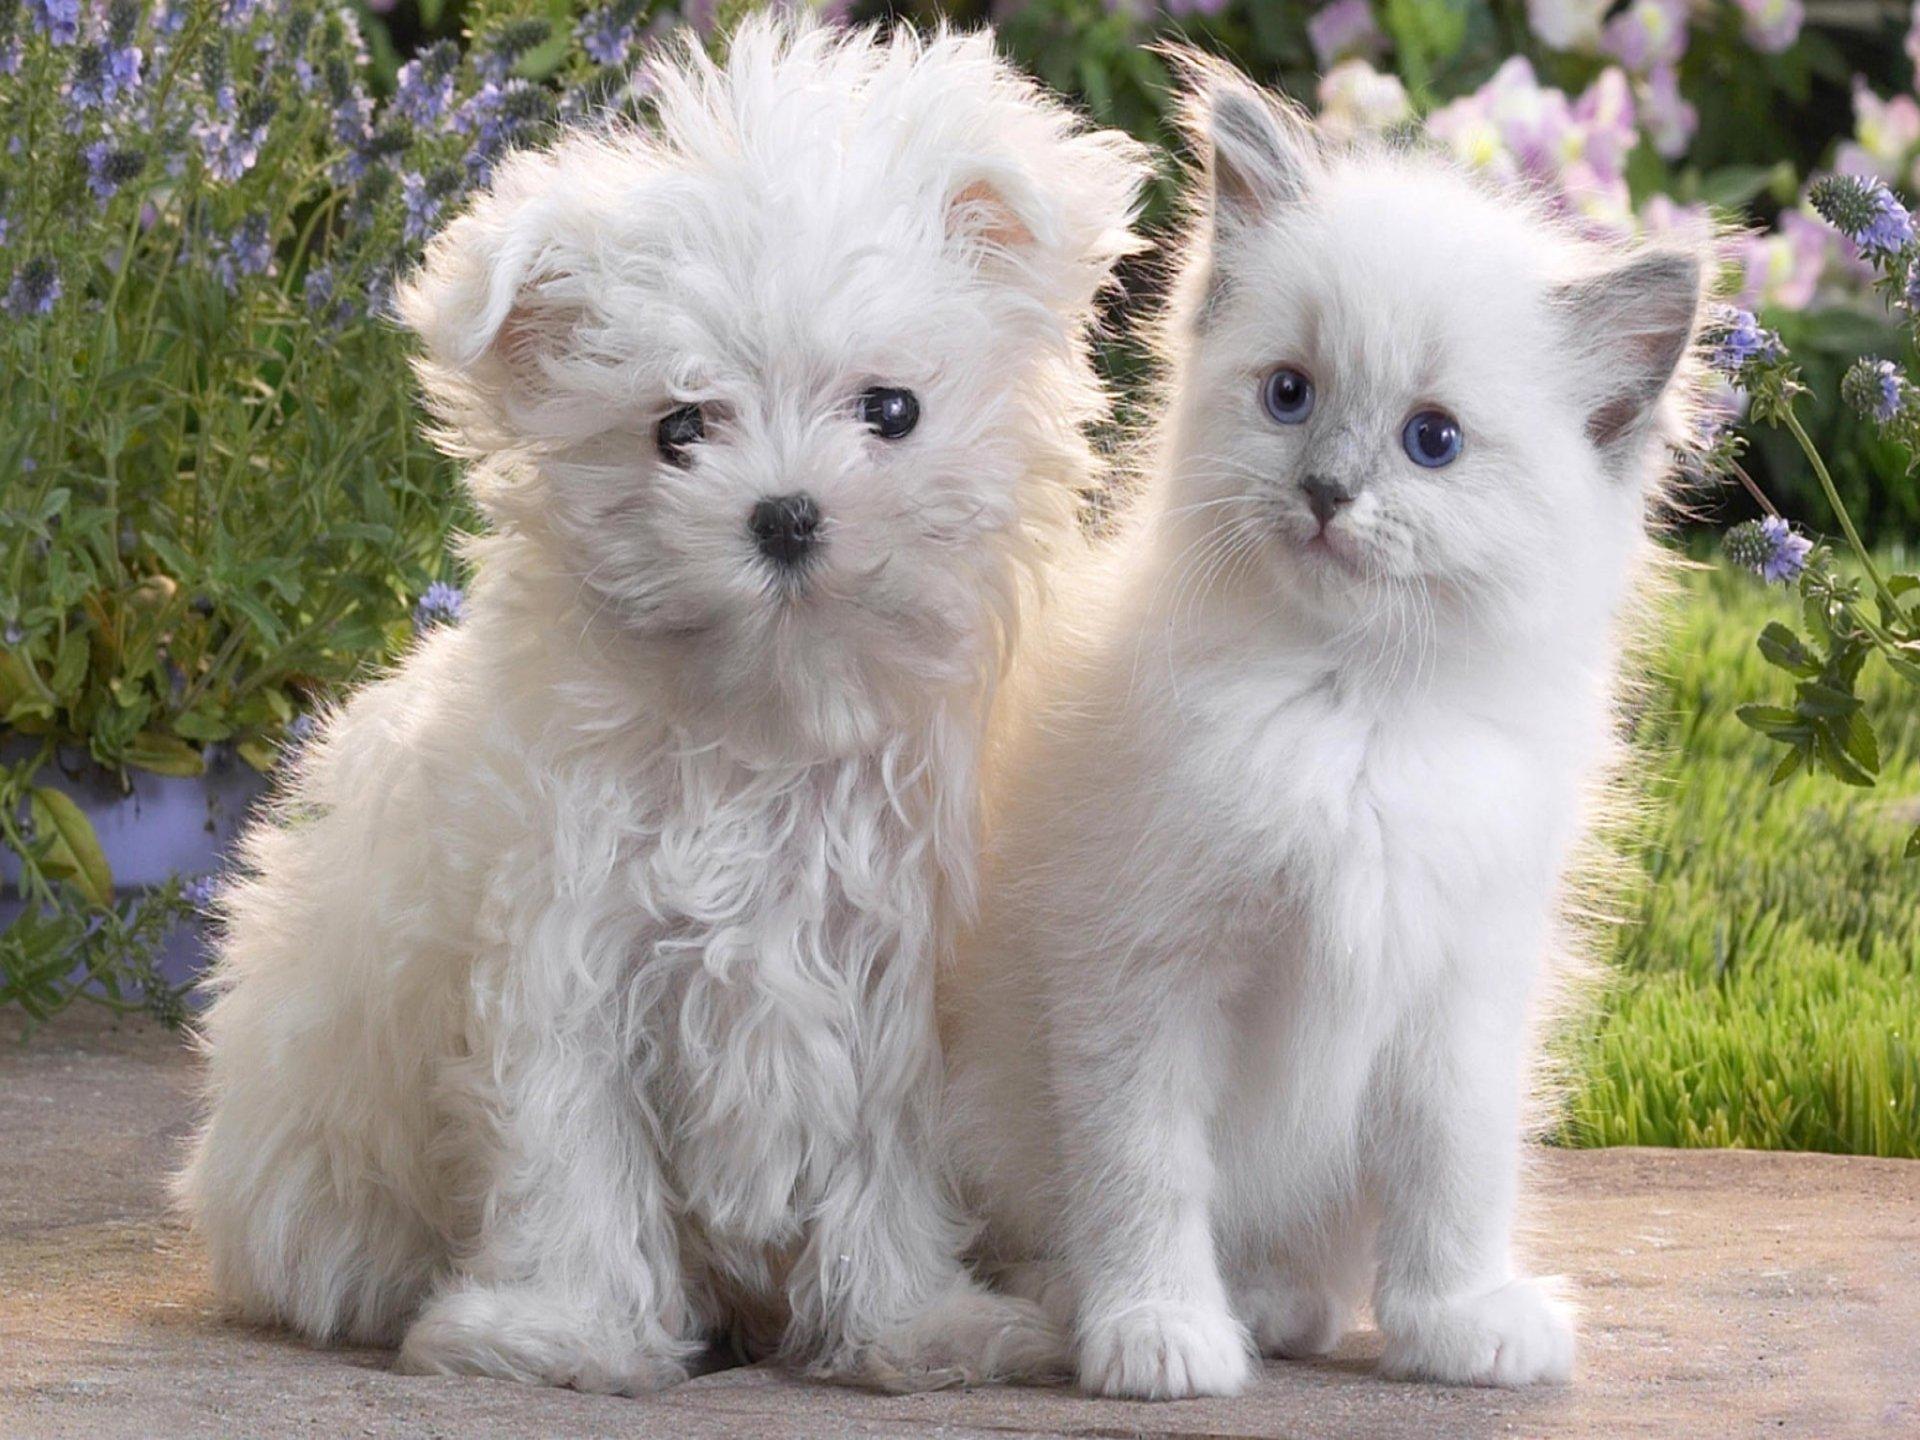 Animal - Cat & Dog  Animal Dog Cat Puppy Kitten White Cute Baby Animal Wallpaper